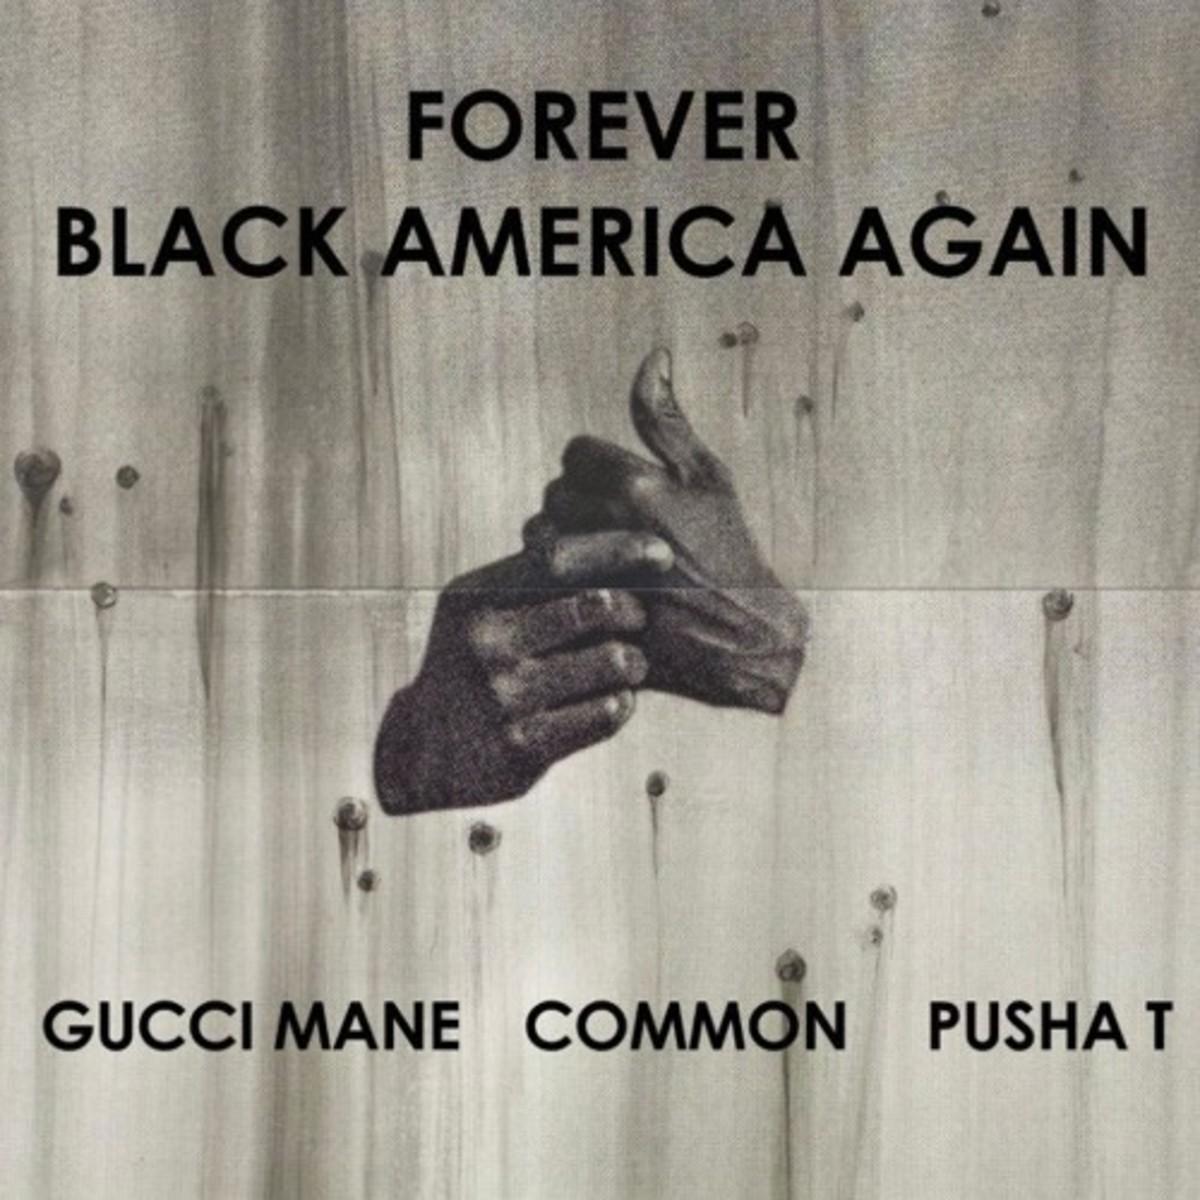 common-black-america-again-remix.jpg